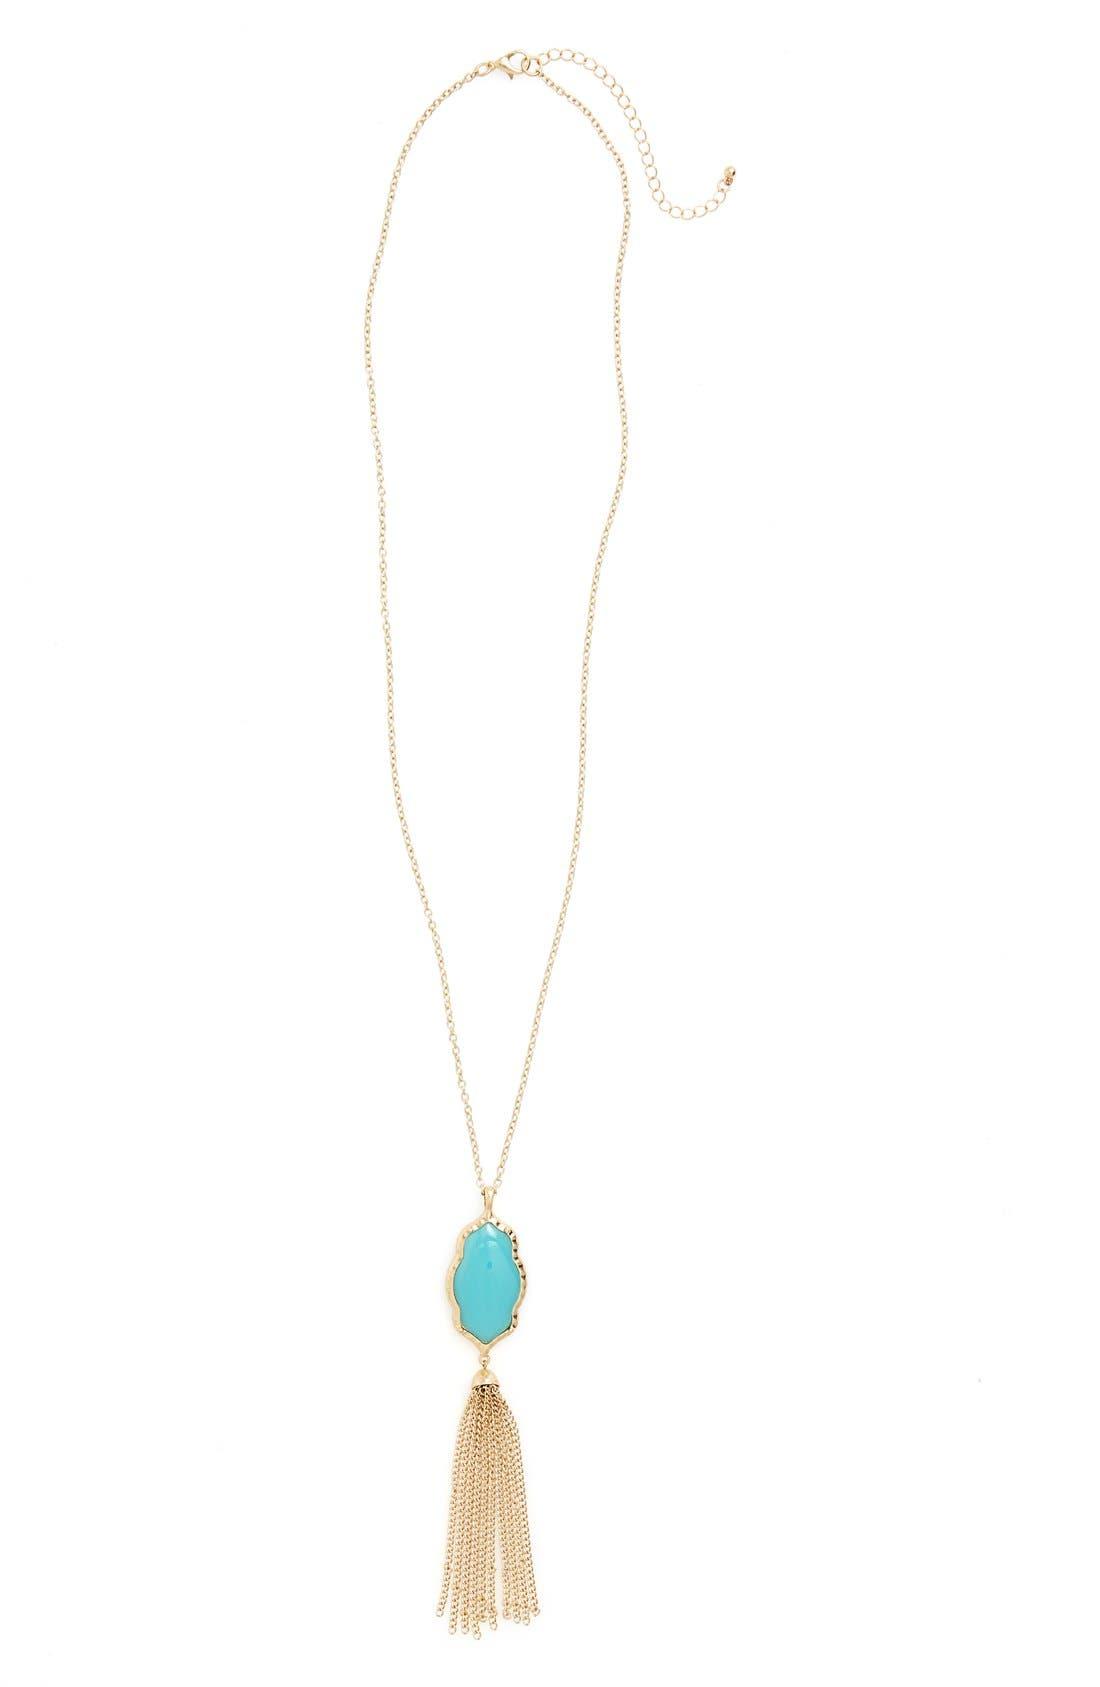 Stone Fringe Pendant Necklace,                         Main,                         color, Turquoise/ Gold